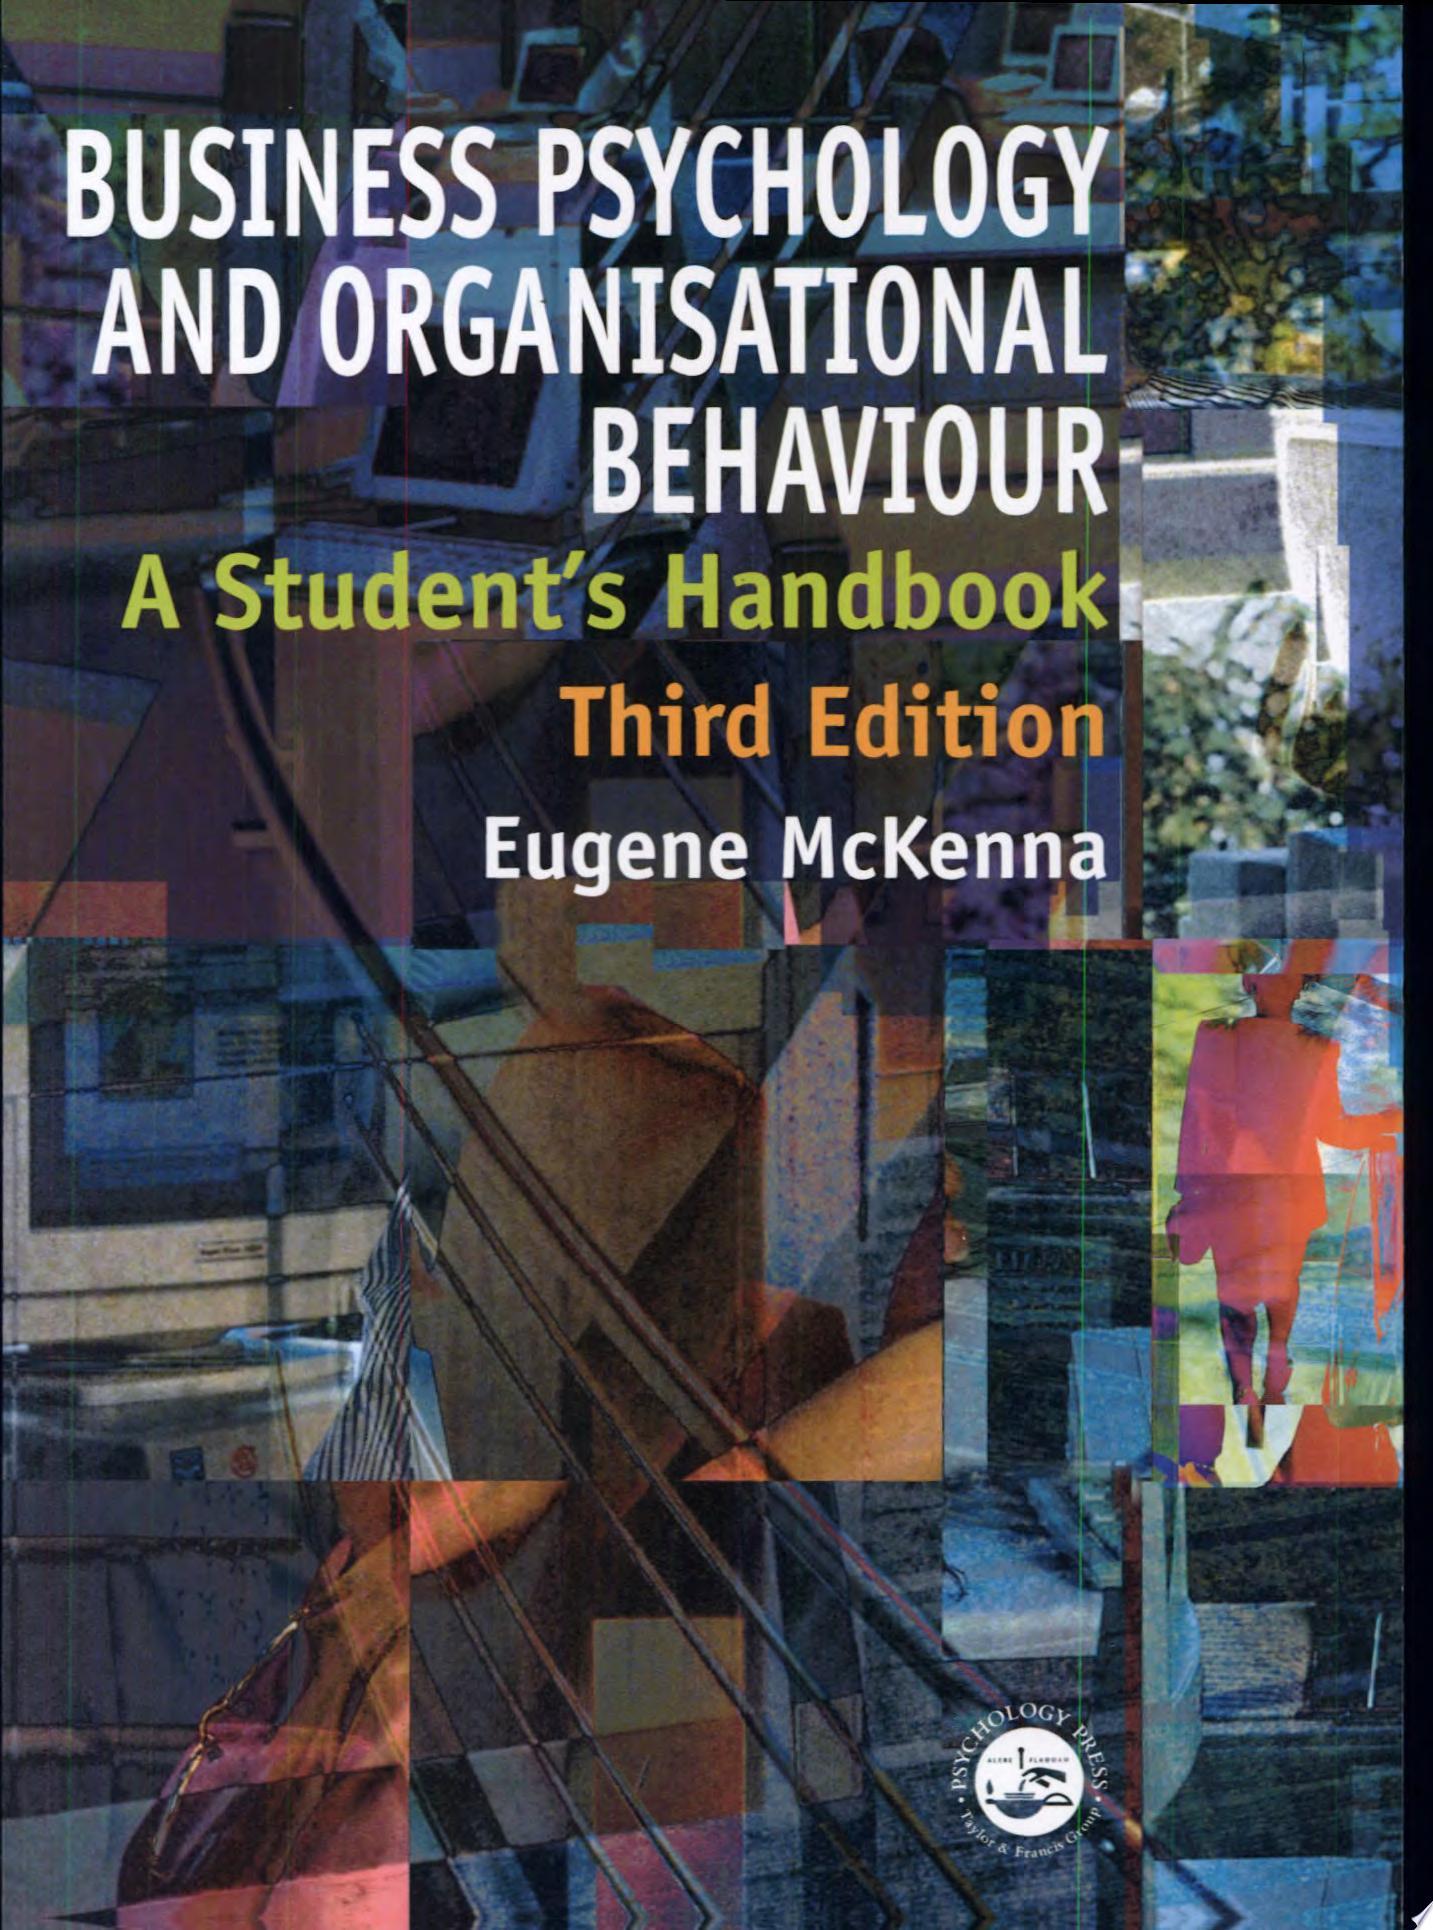 Business Psychology and Organisational Behaviour